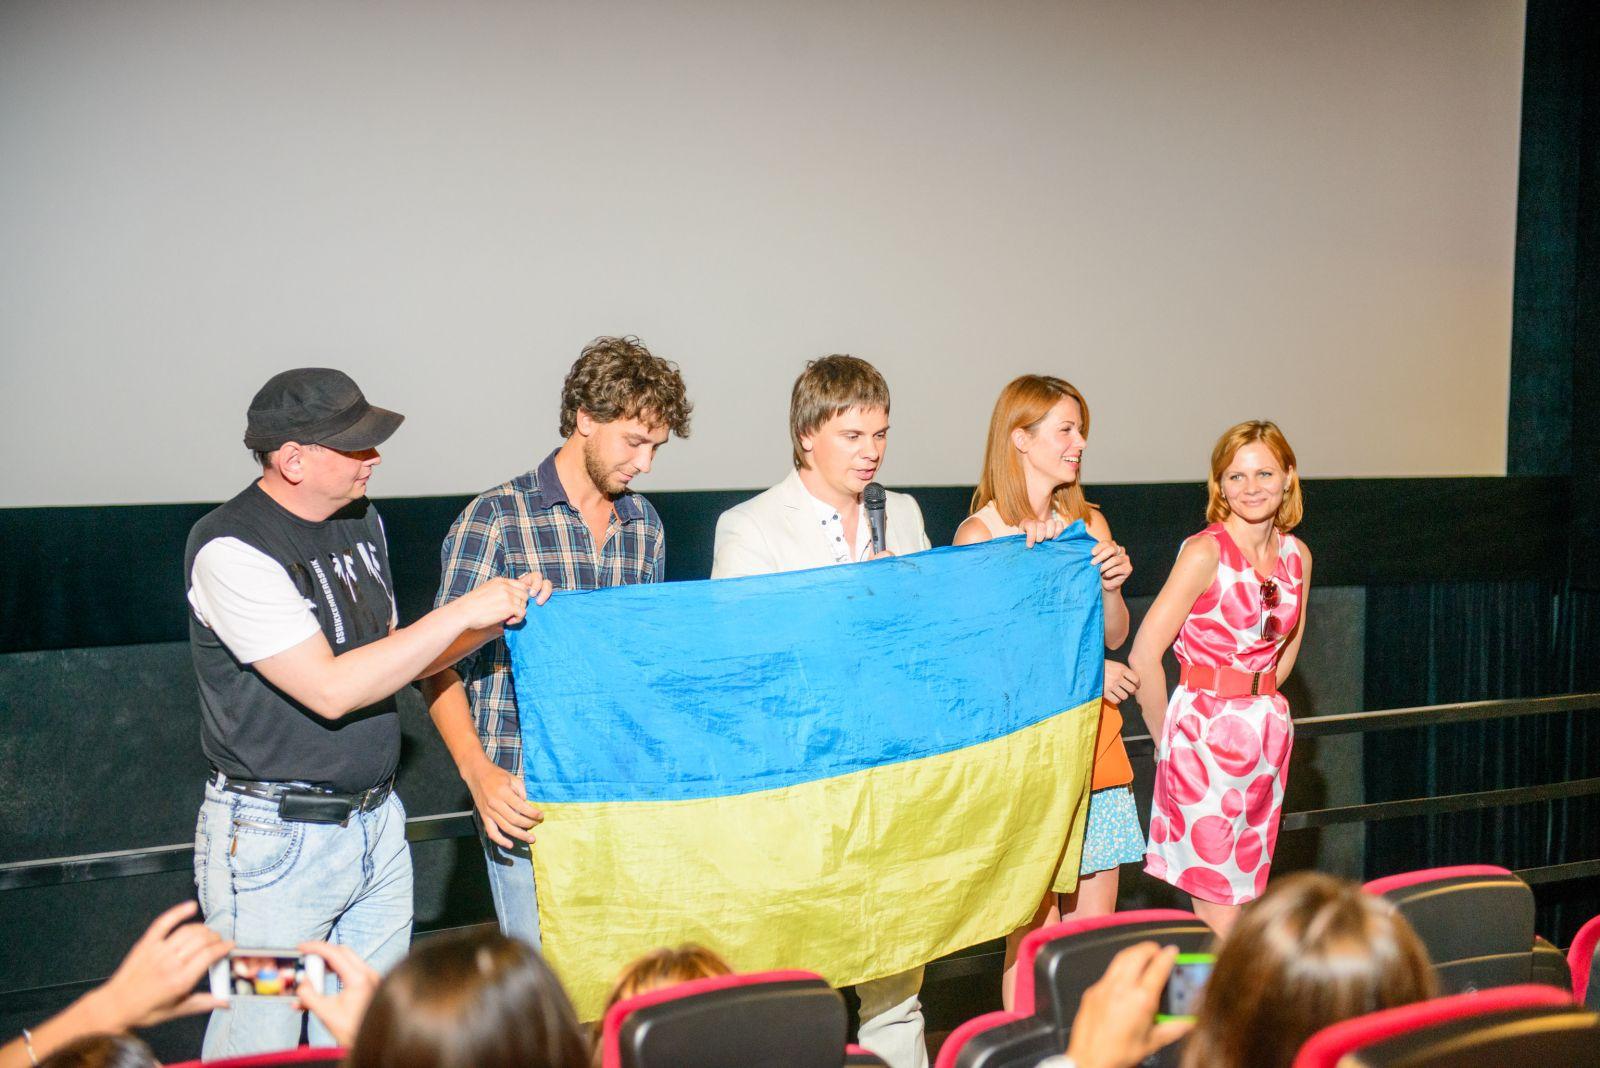 Дмитрий Комаров с украинским флагом